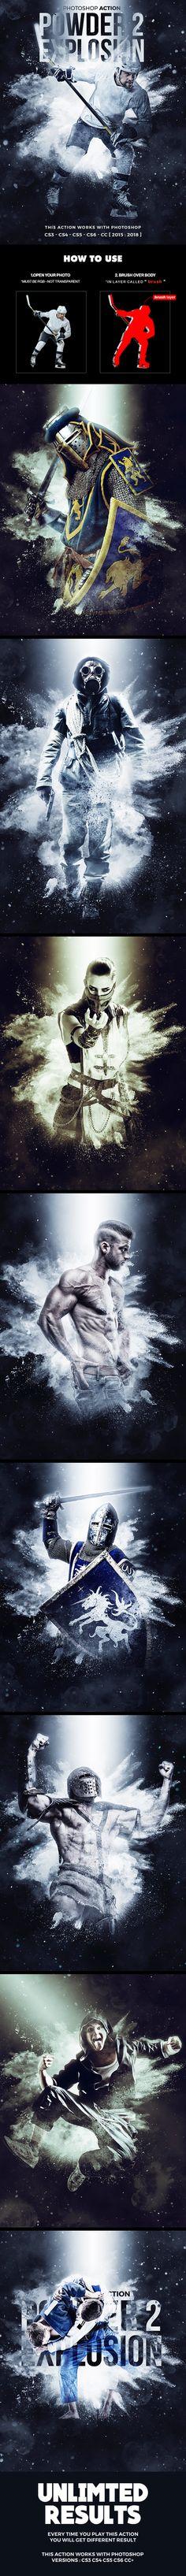 Powder Explosion 2 Photoshop Action — Photoshop ATN #power #action • Download ➝ https://graphicriver.net/item/powder-explosion-2-photoshop-action/21761850?ref=pxcr